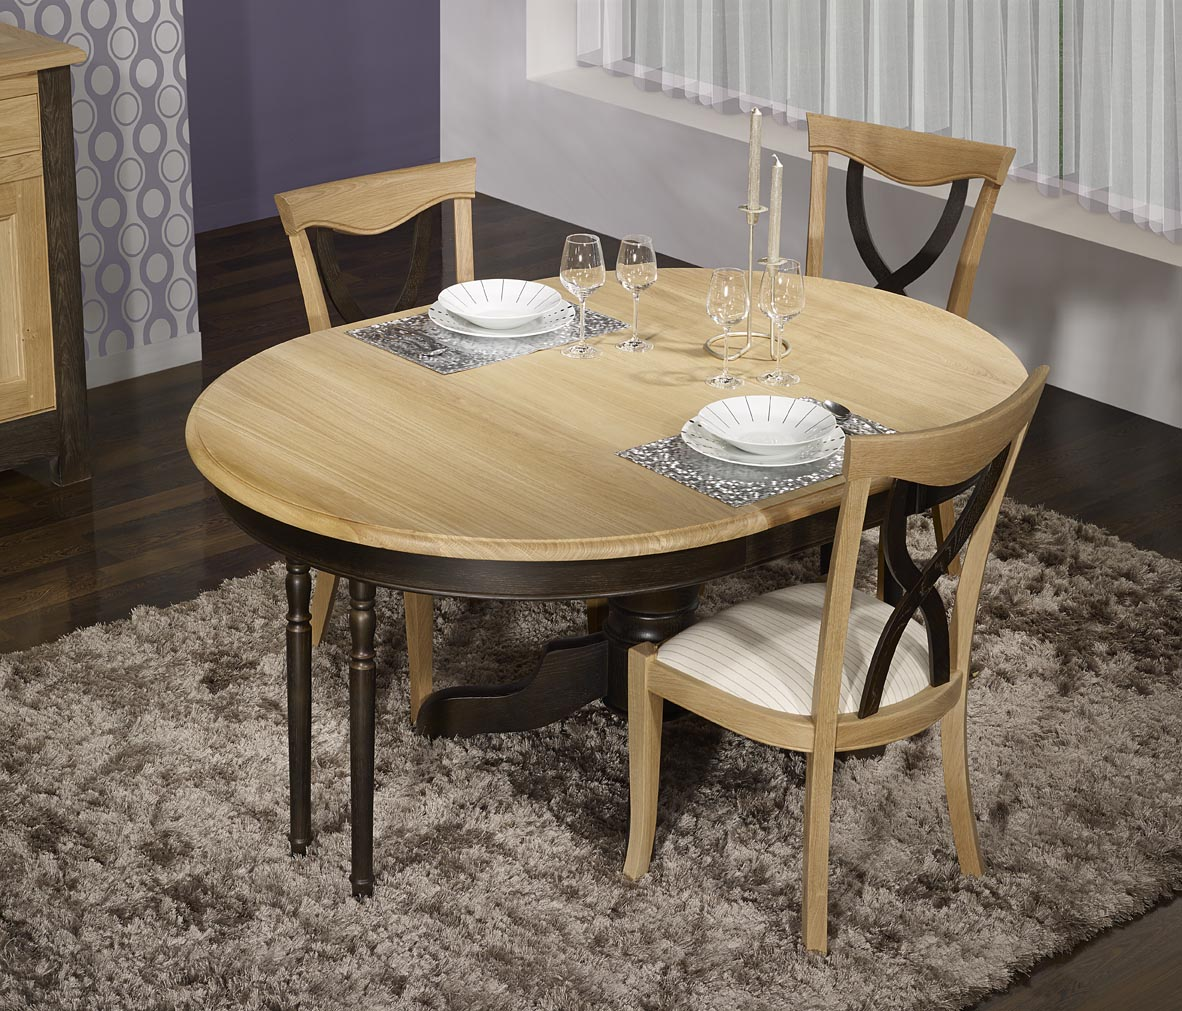 Table ronde pied central en ch ne massif de style louis for Table ronde 6 pieds